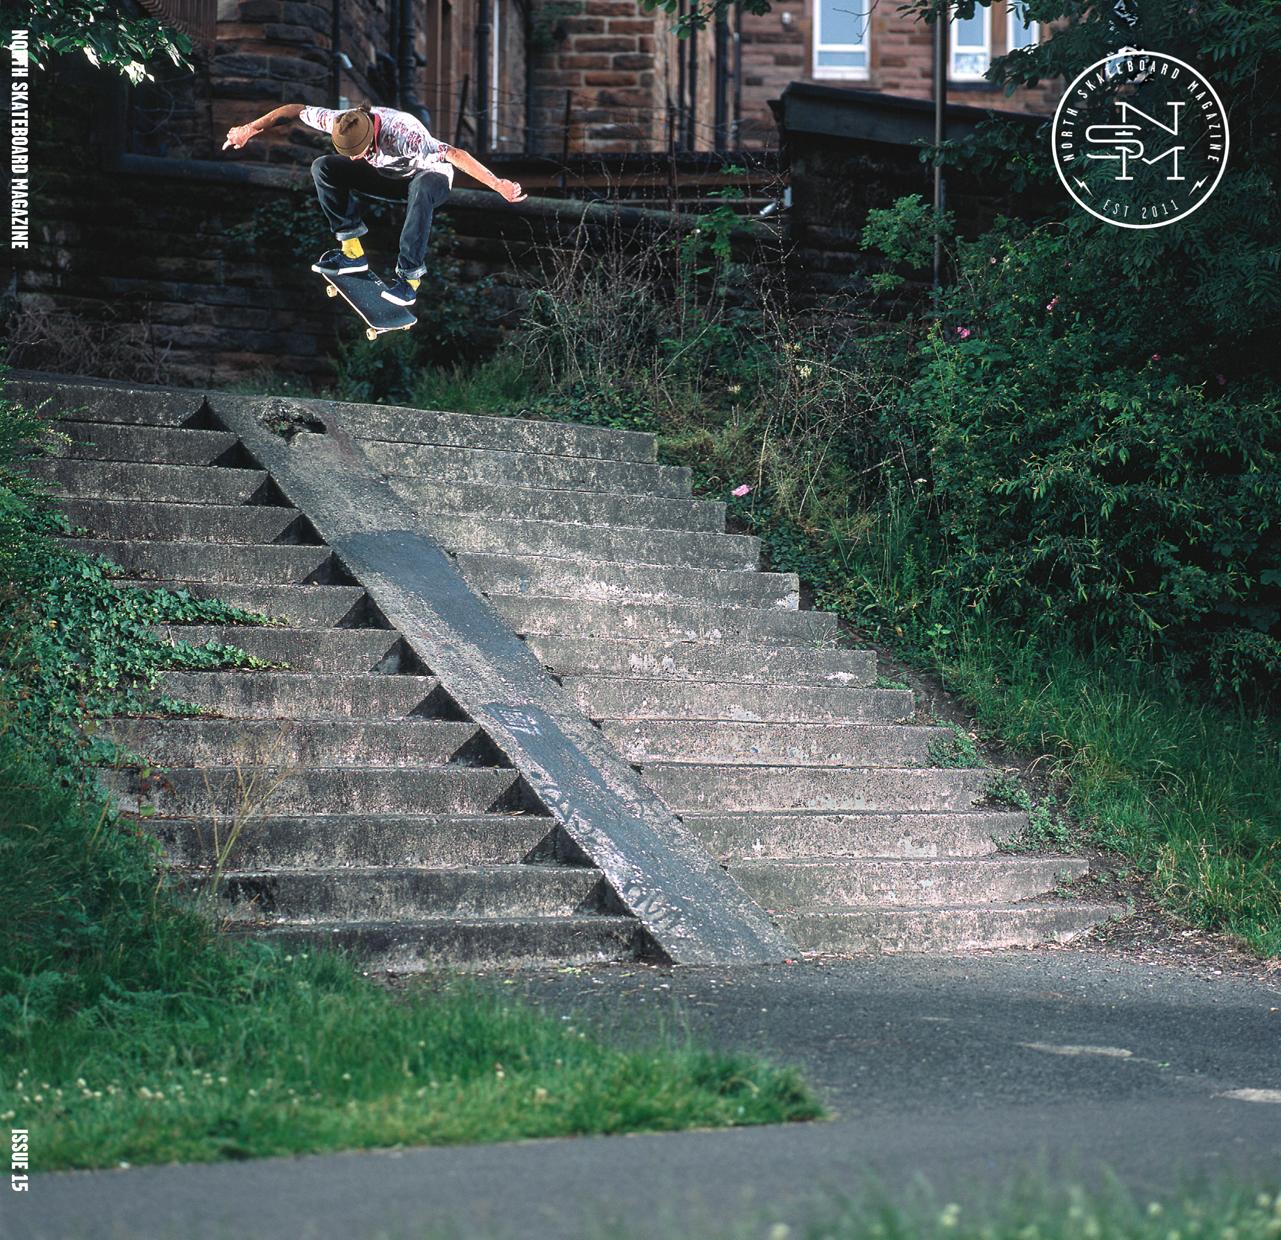 Cover: Freddie Lusk - Kickflip  Photographer: Graham Tait